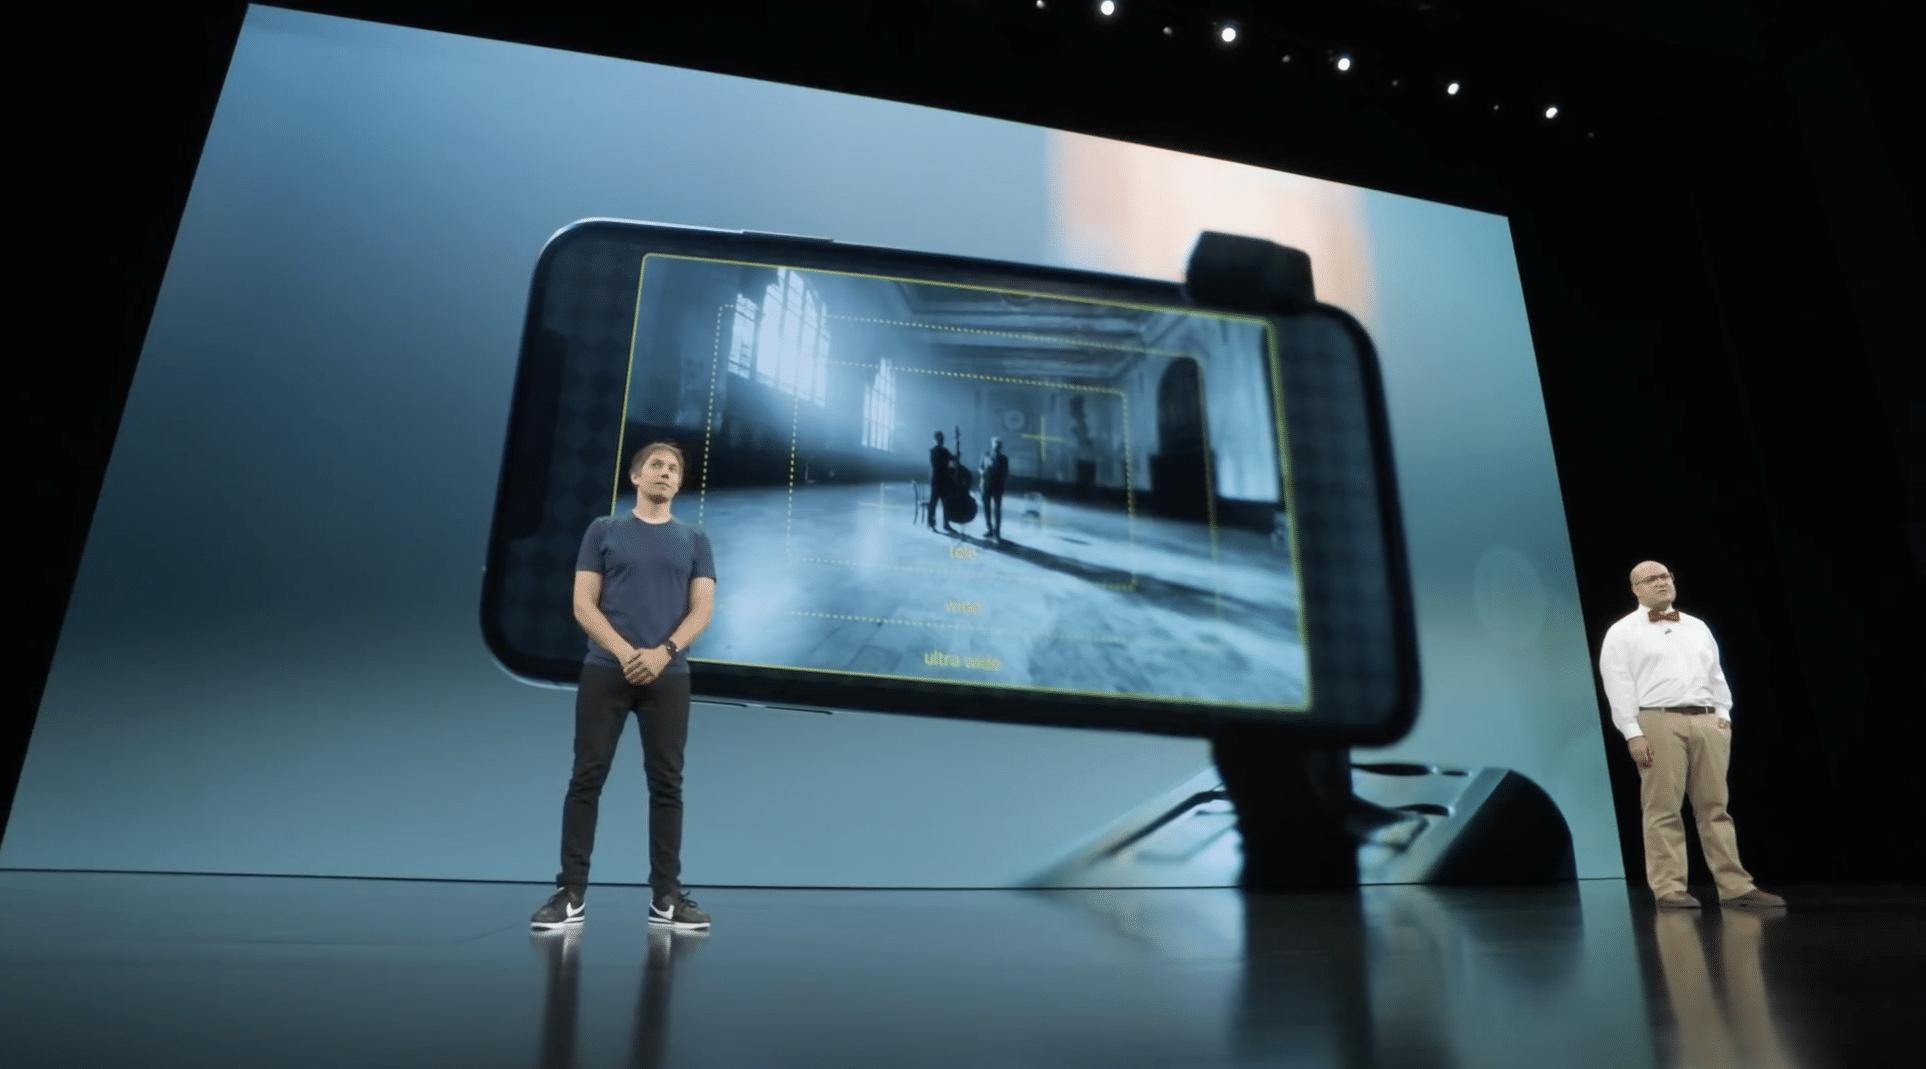 iphone-11-pro-camera-design-has-a-specific-purpose 2